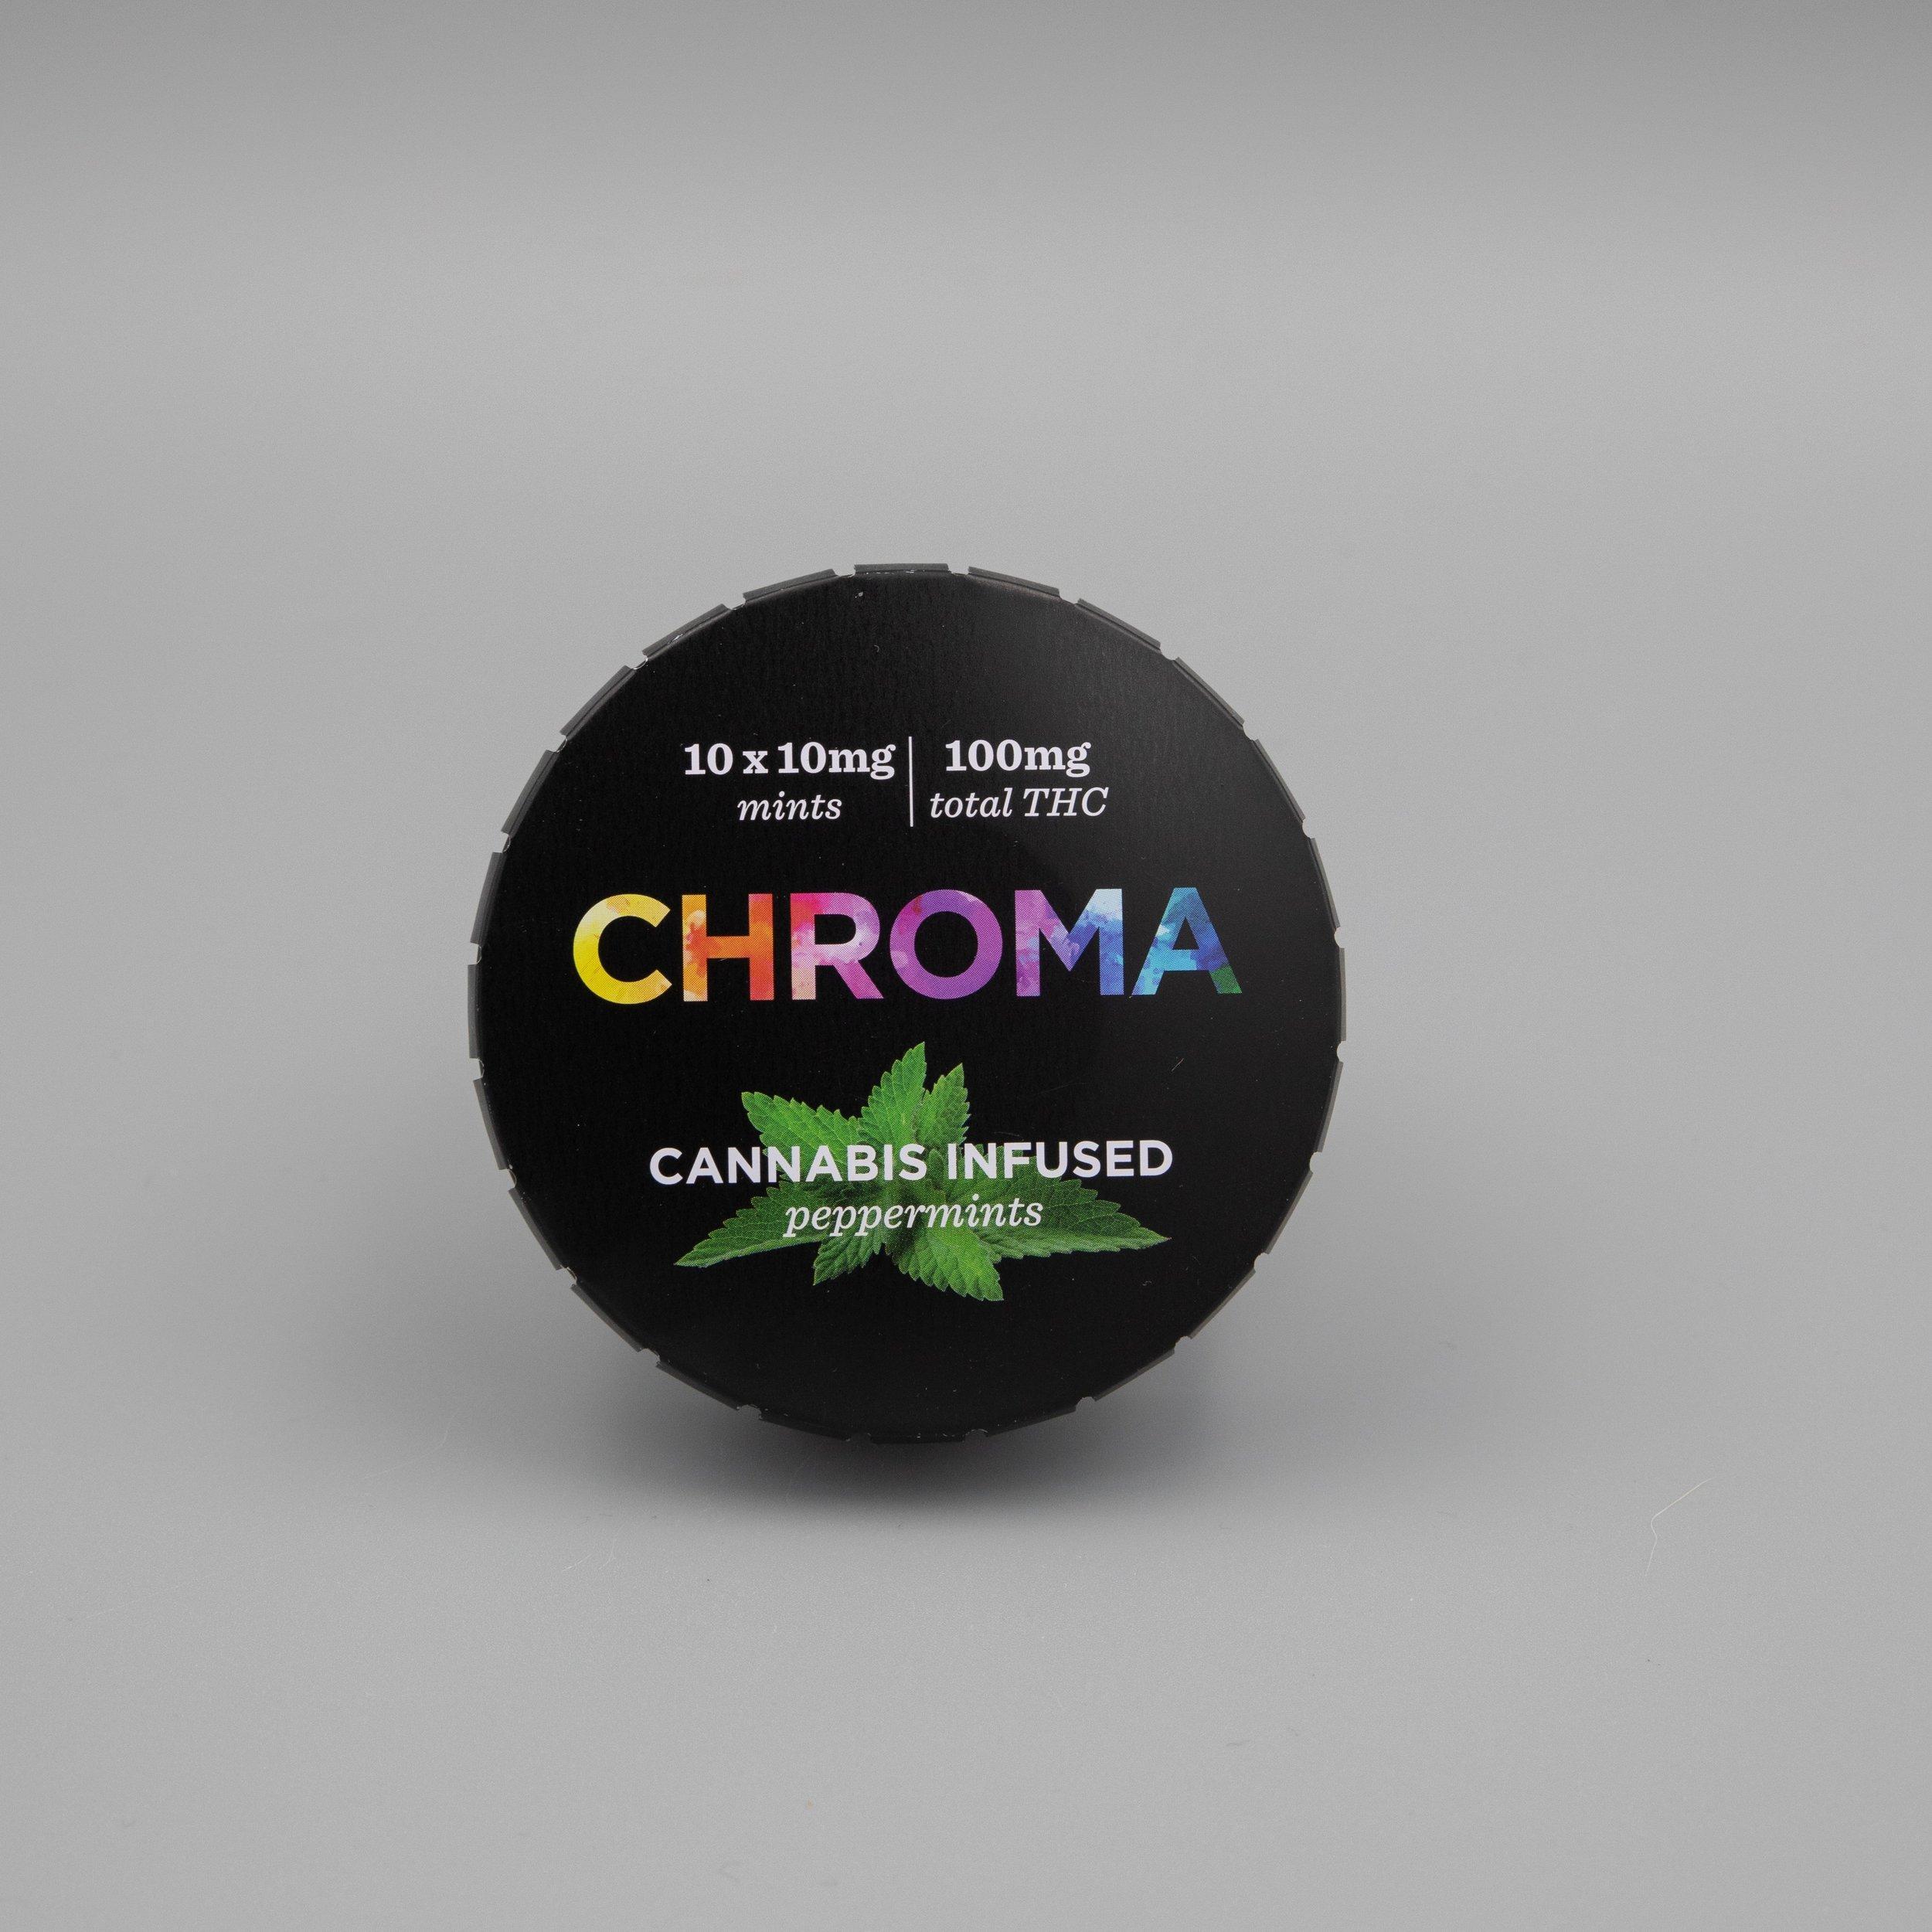 chroma-peppermints.jpg